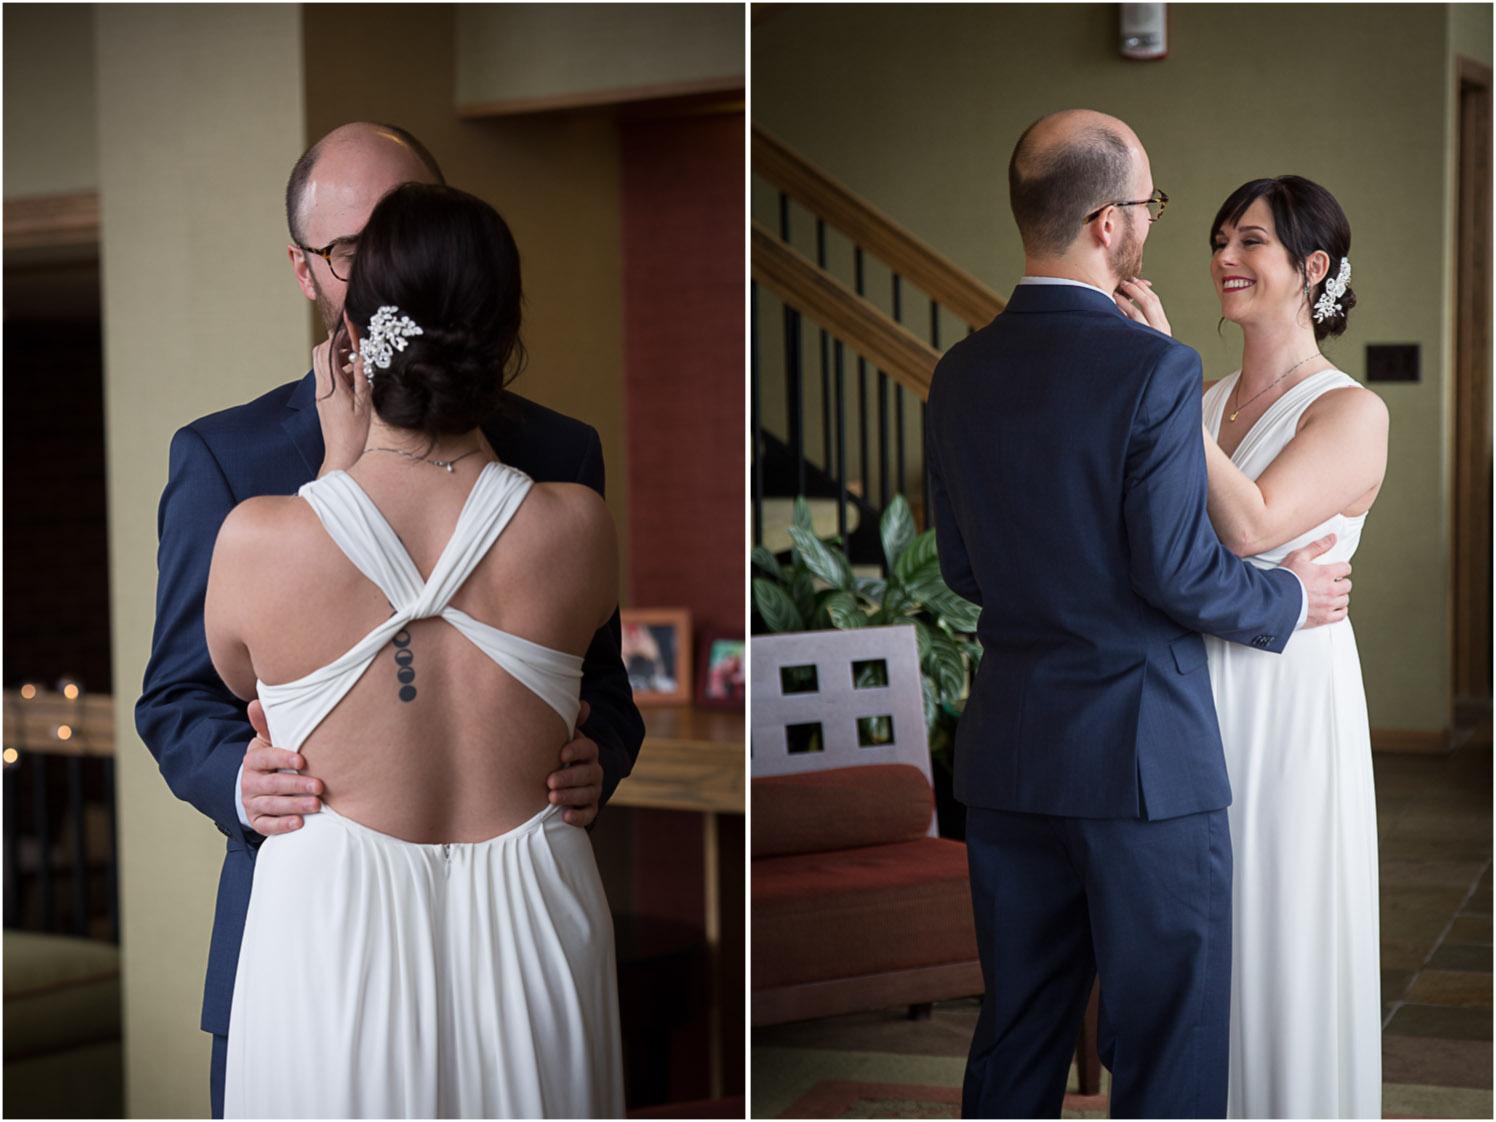 09-loring-green-wedding-minneapolis-minnesota-bride-and-groom-first-look-mahonen-photography.jpg